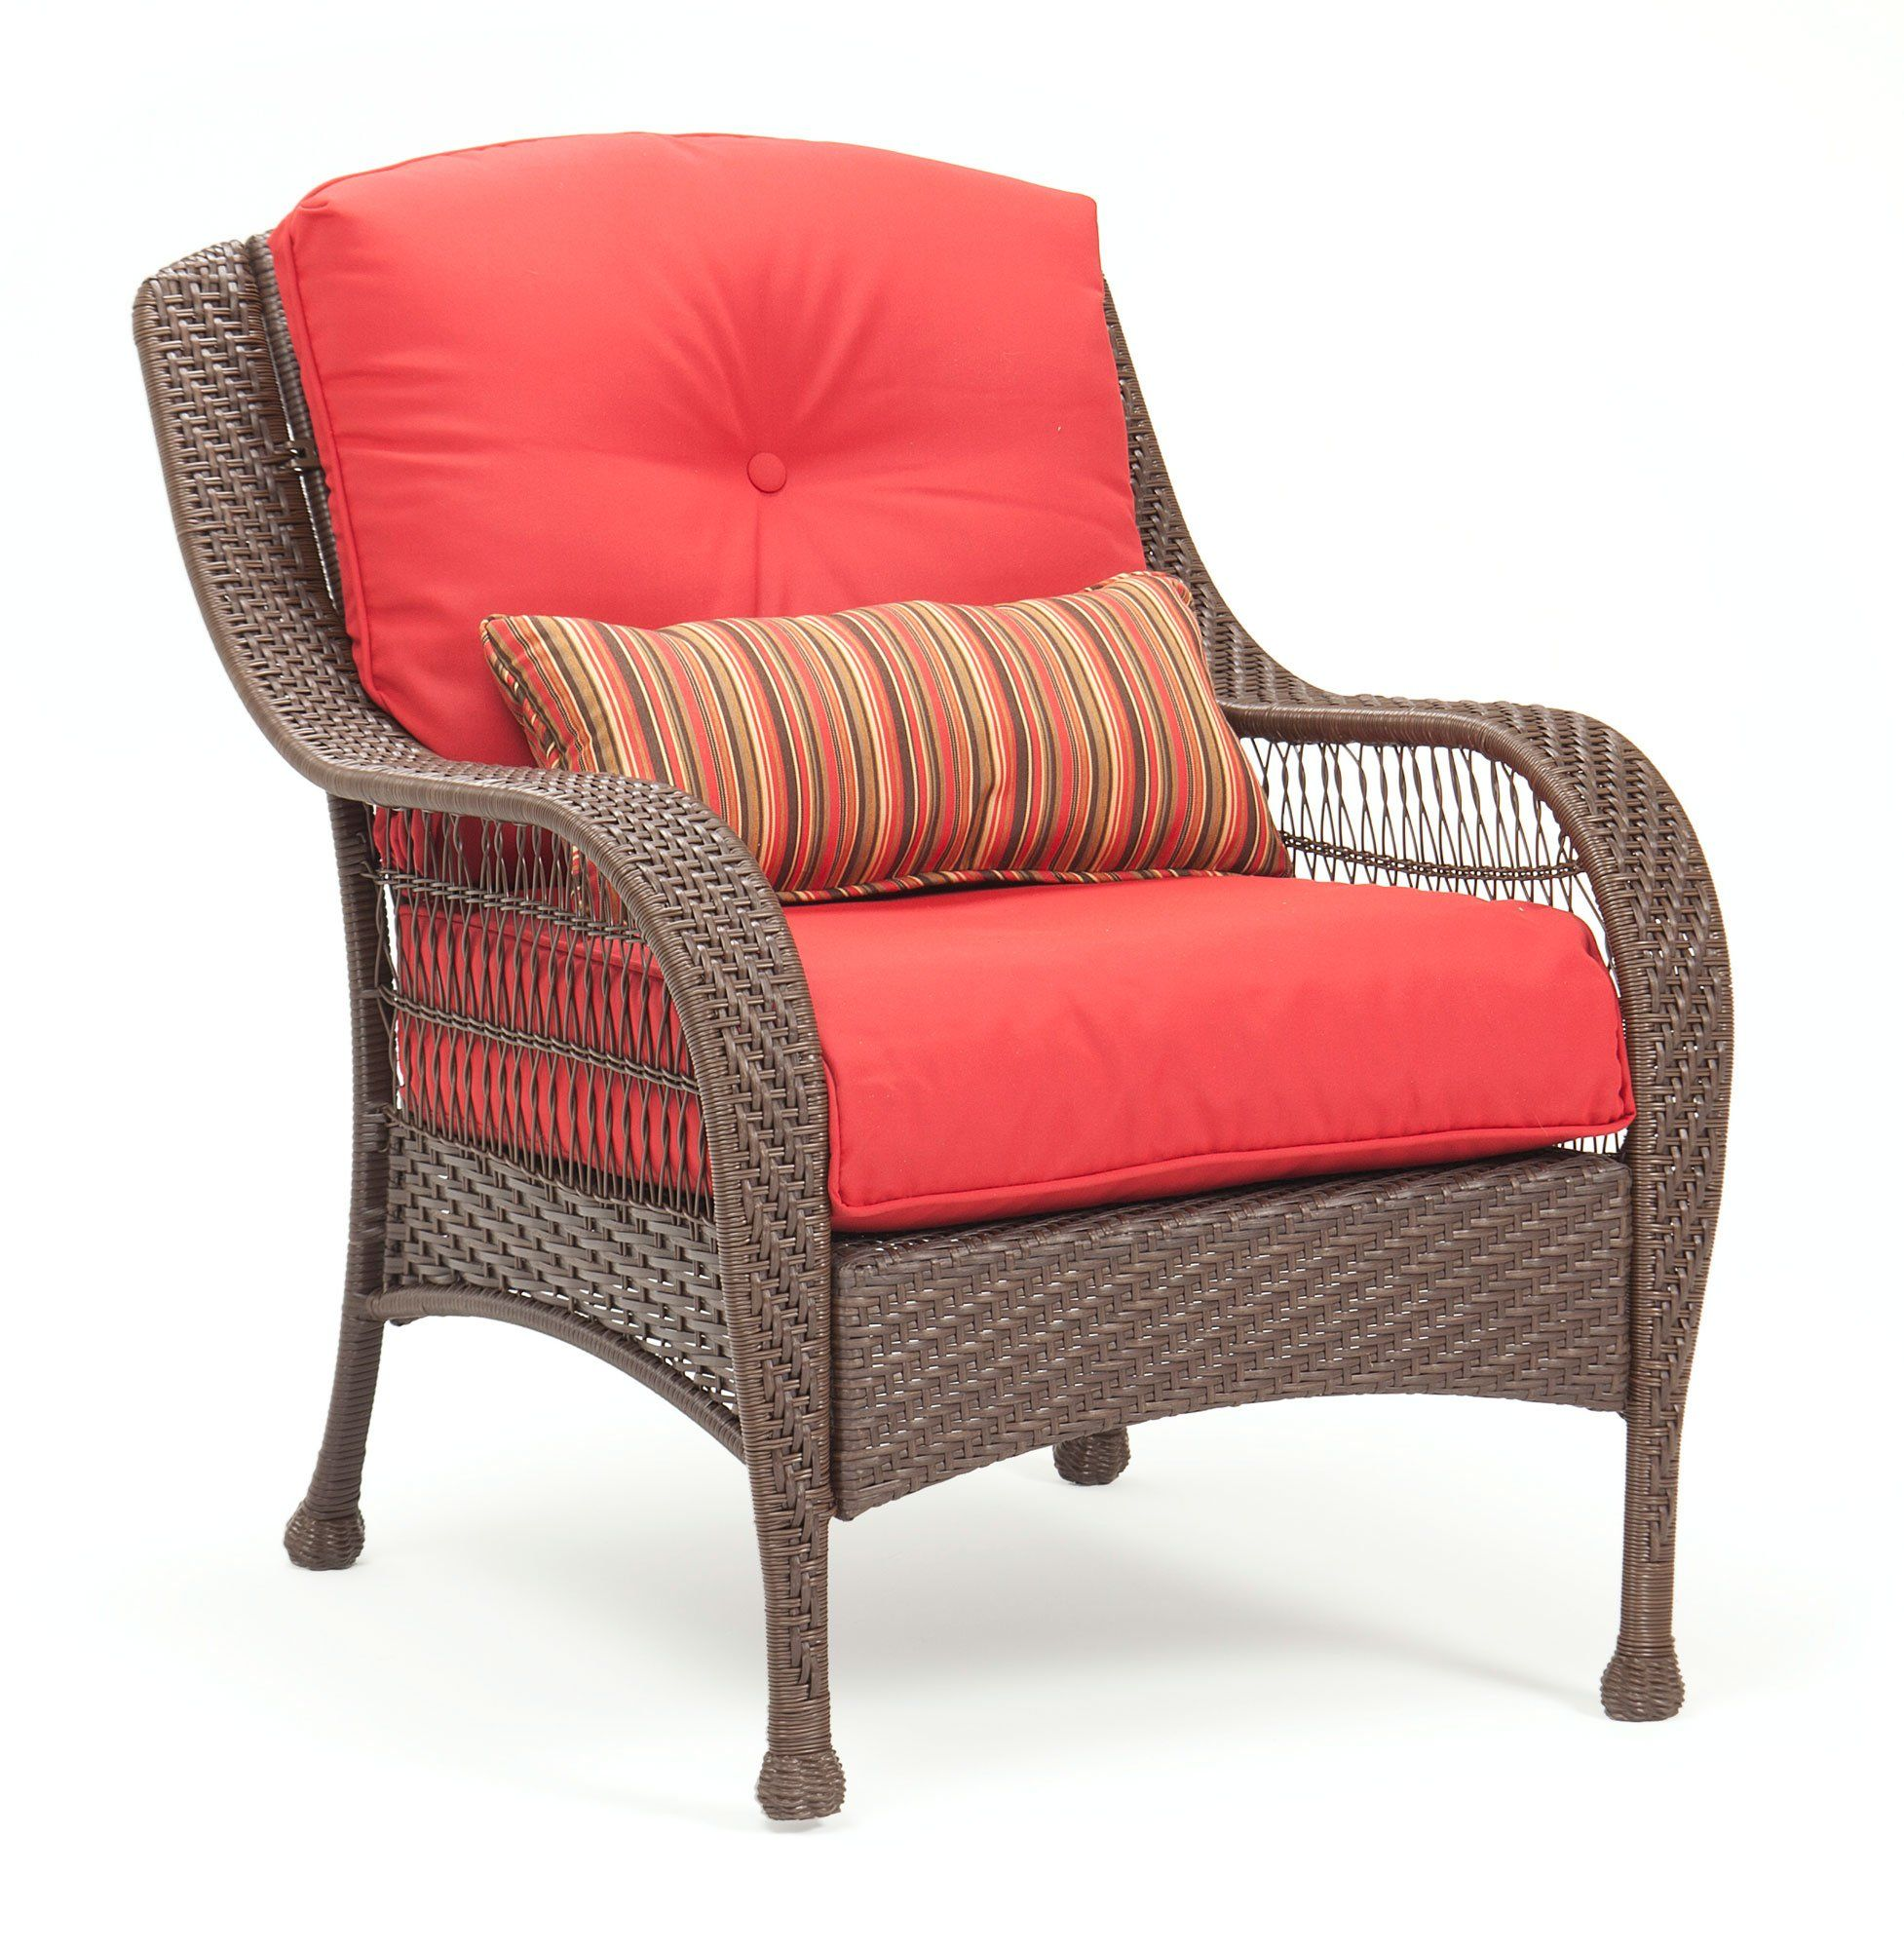 LaZBoy Outdoor Bristol Resin Wicker Patio Furniture ...